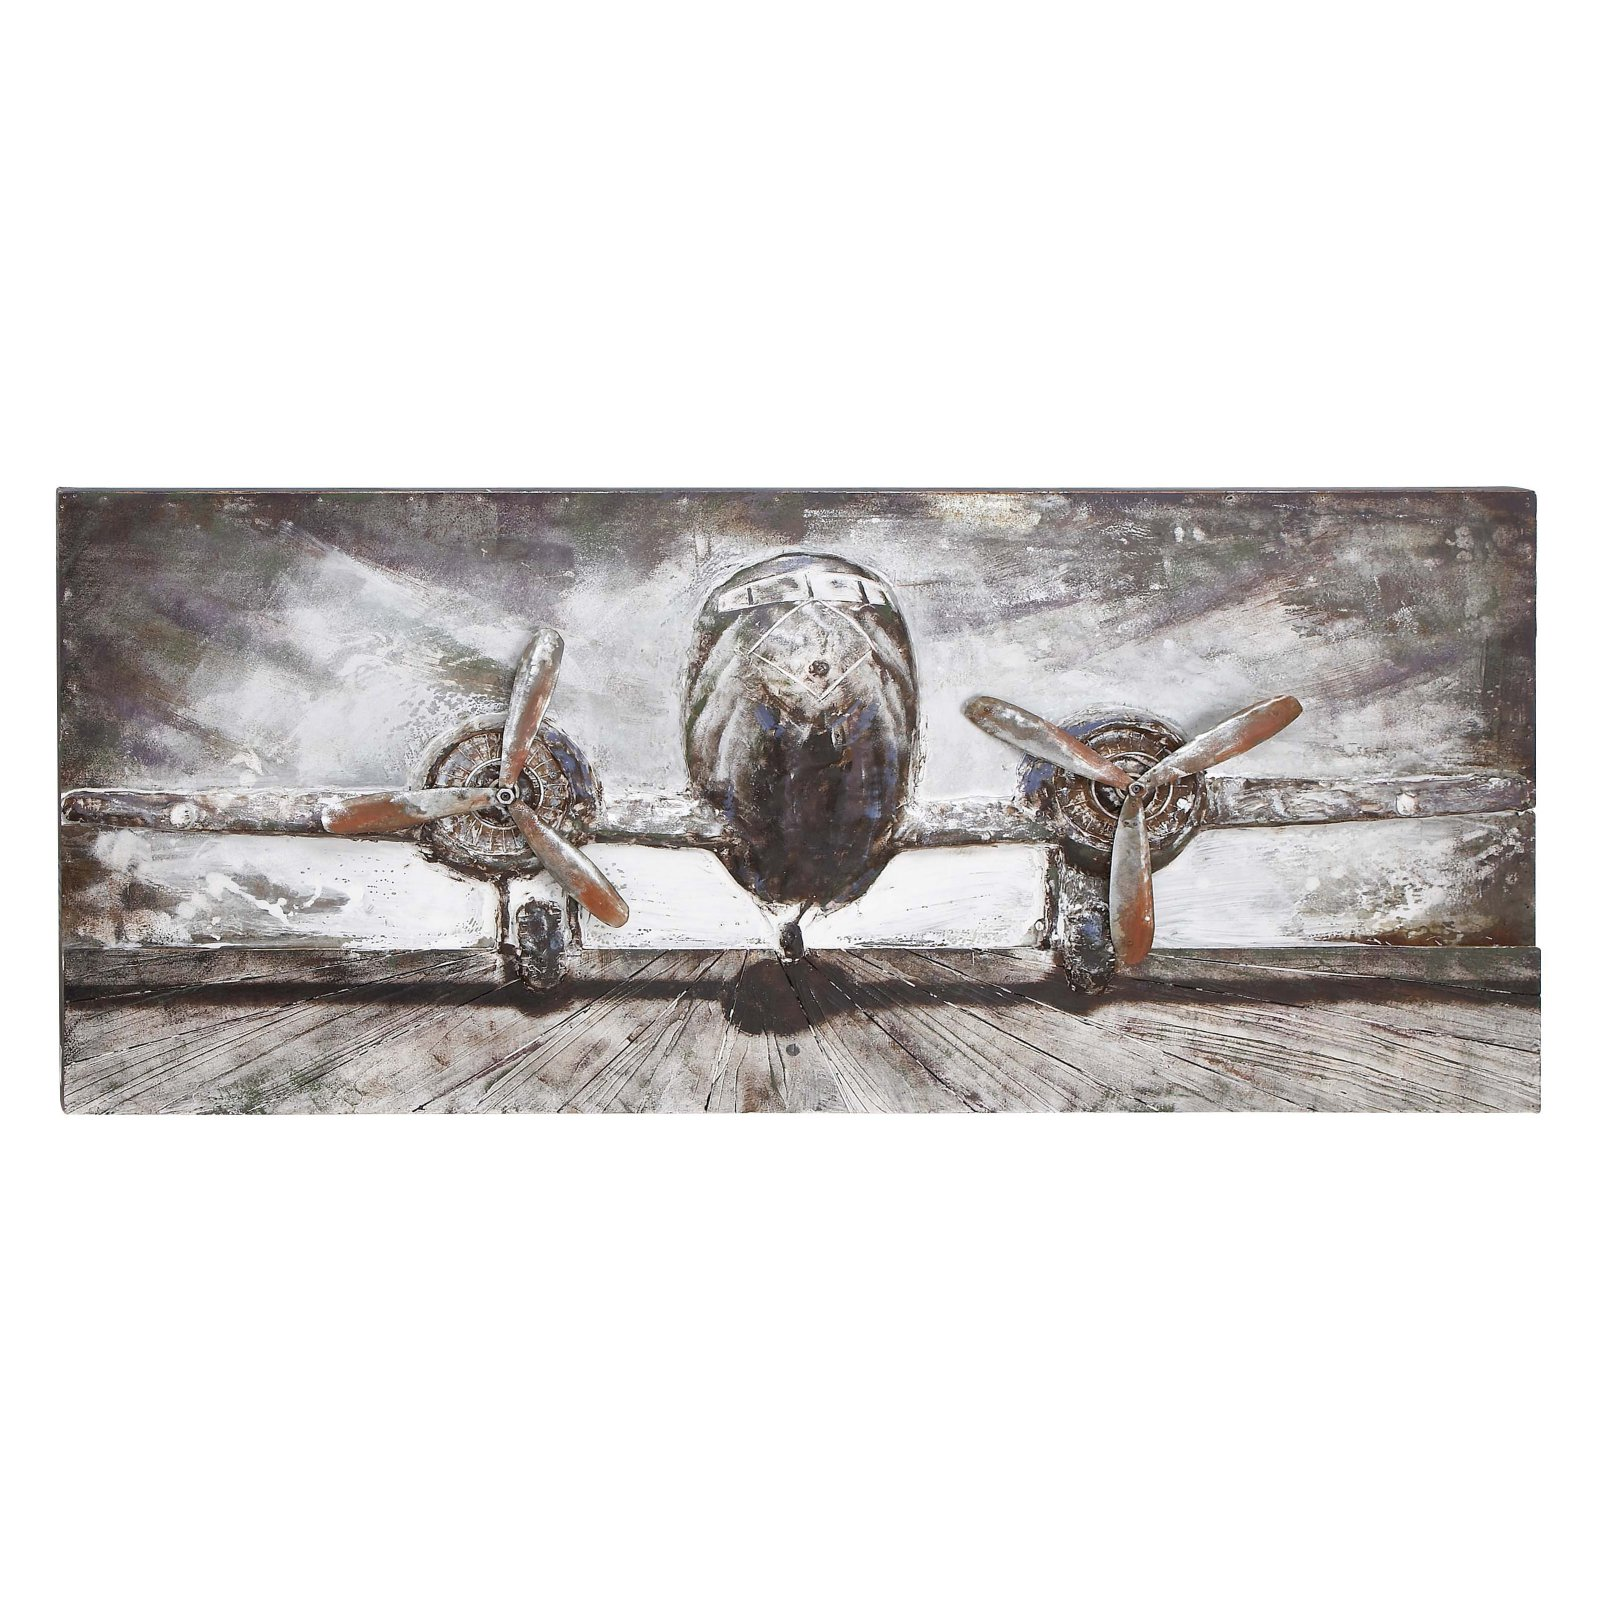 Woodland Imports Airplane Wall Artwork 59W x 28H in. by Benzara Inc